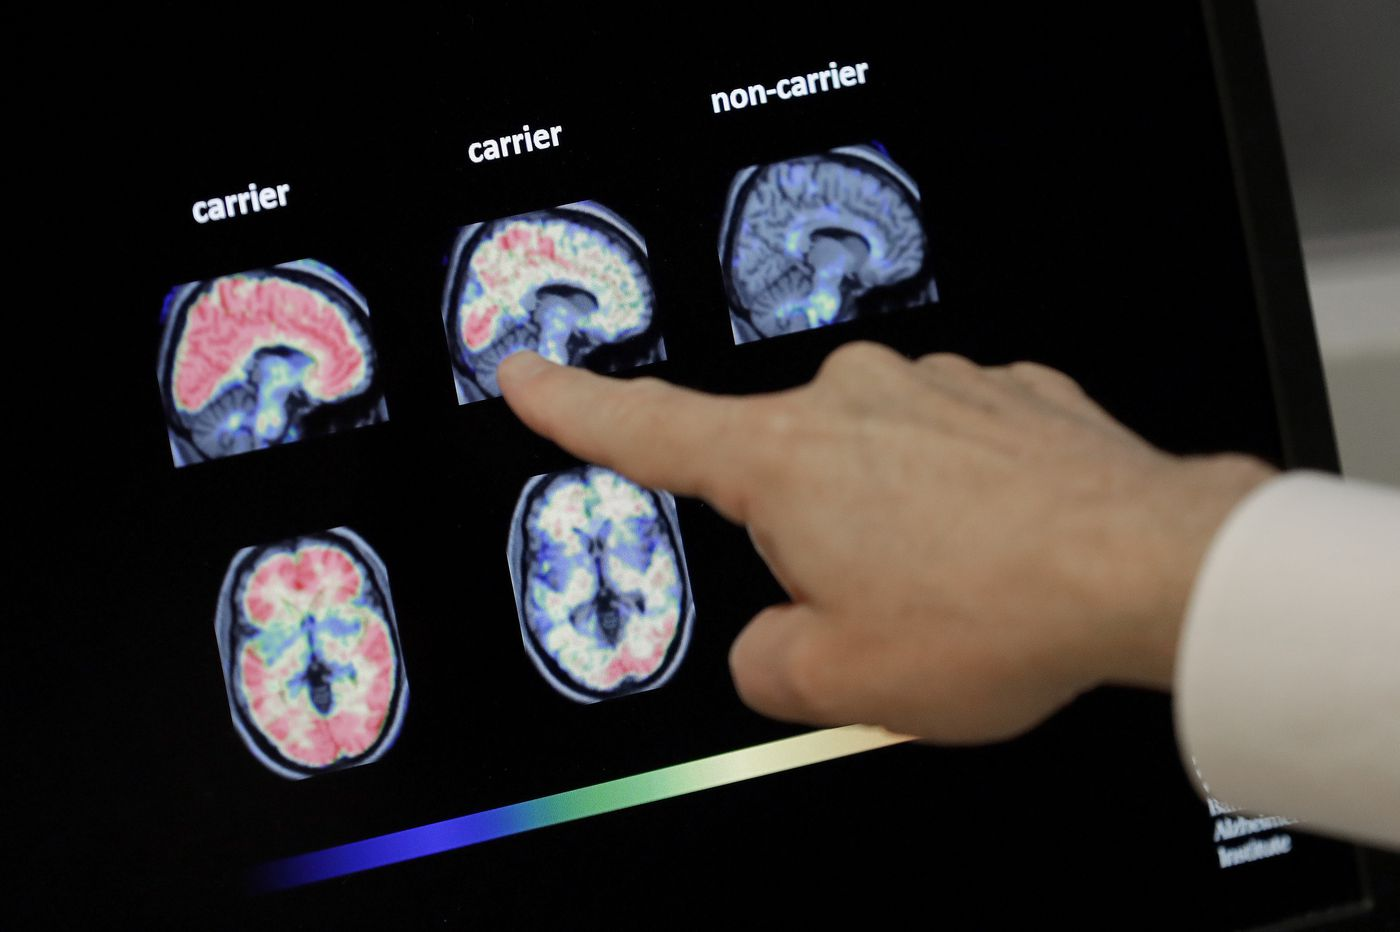 I was devastated when Biogen cancelled my Alzheimer's drug trial. Now I'm just bitter. | Opinion